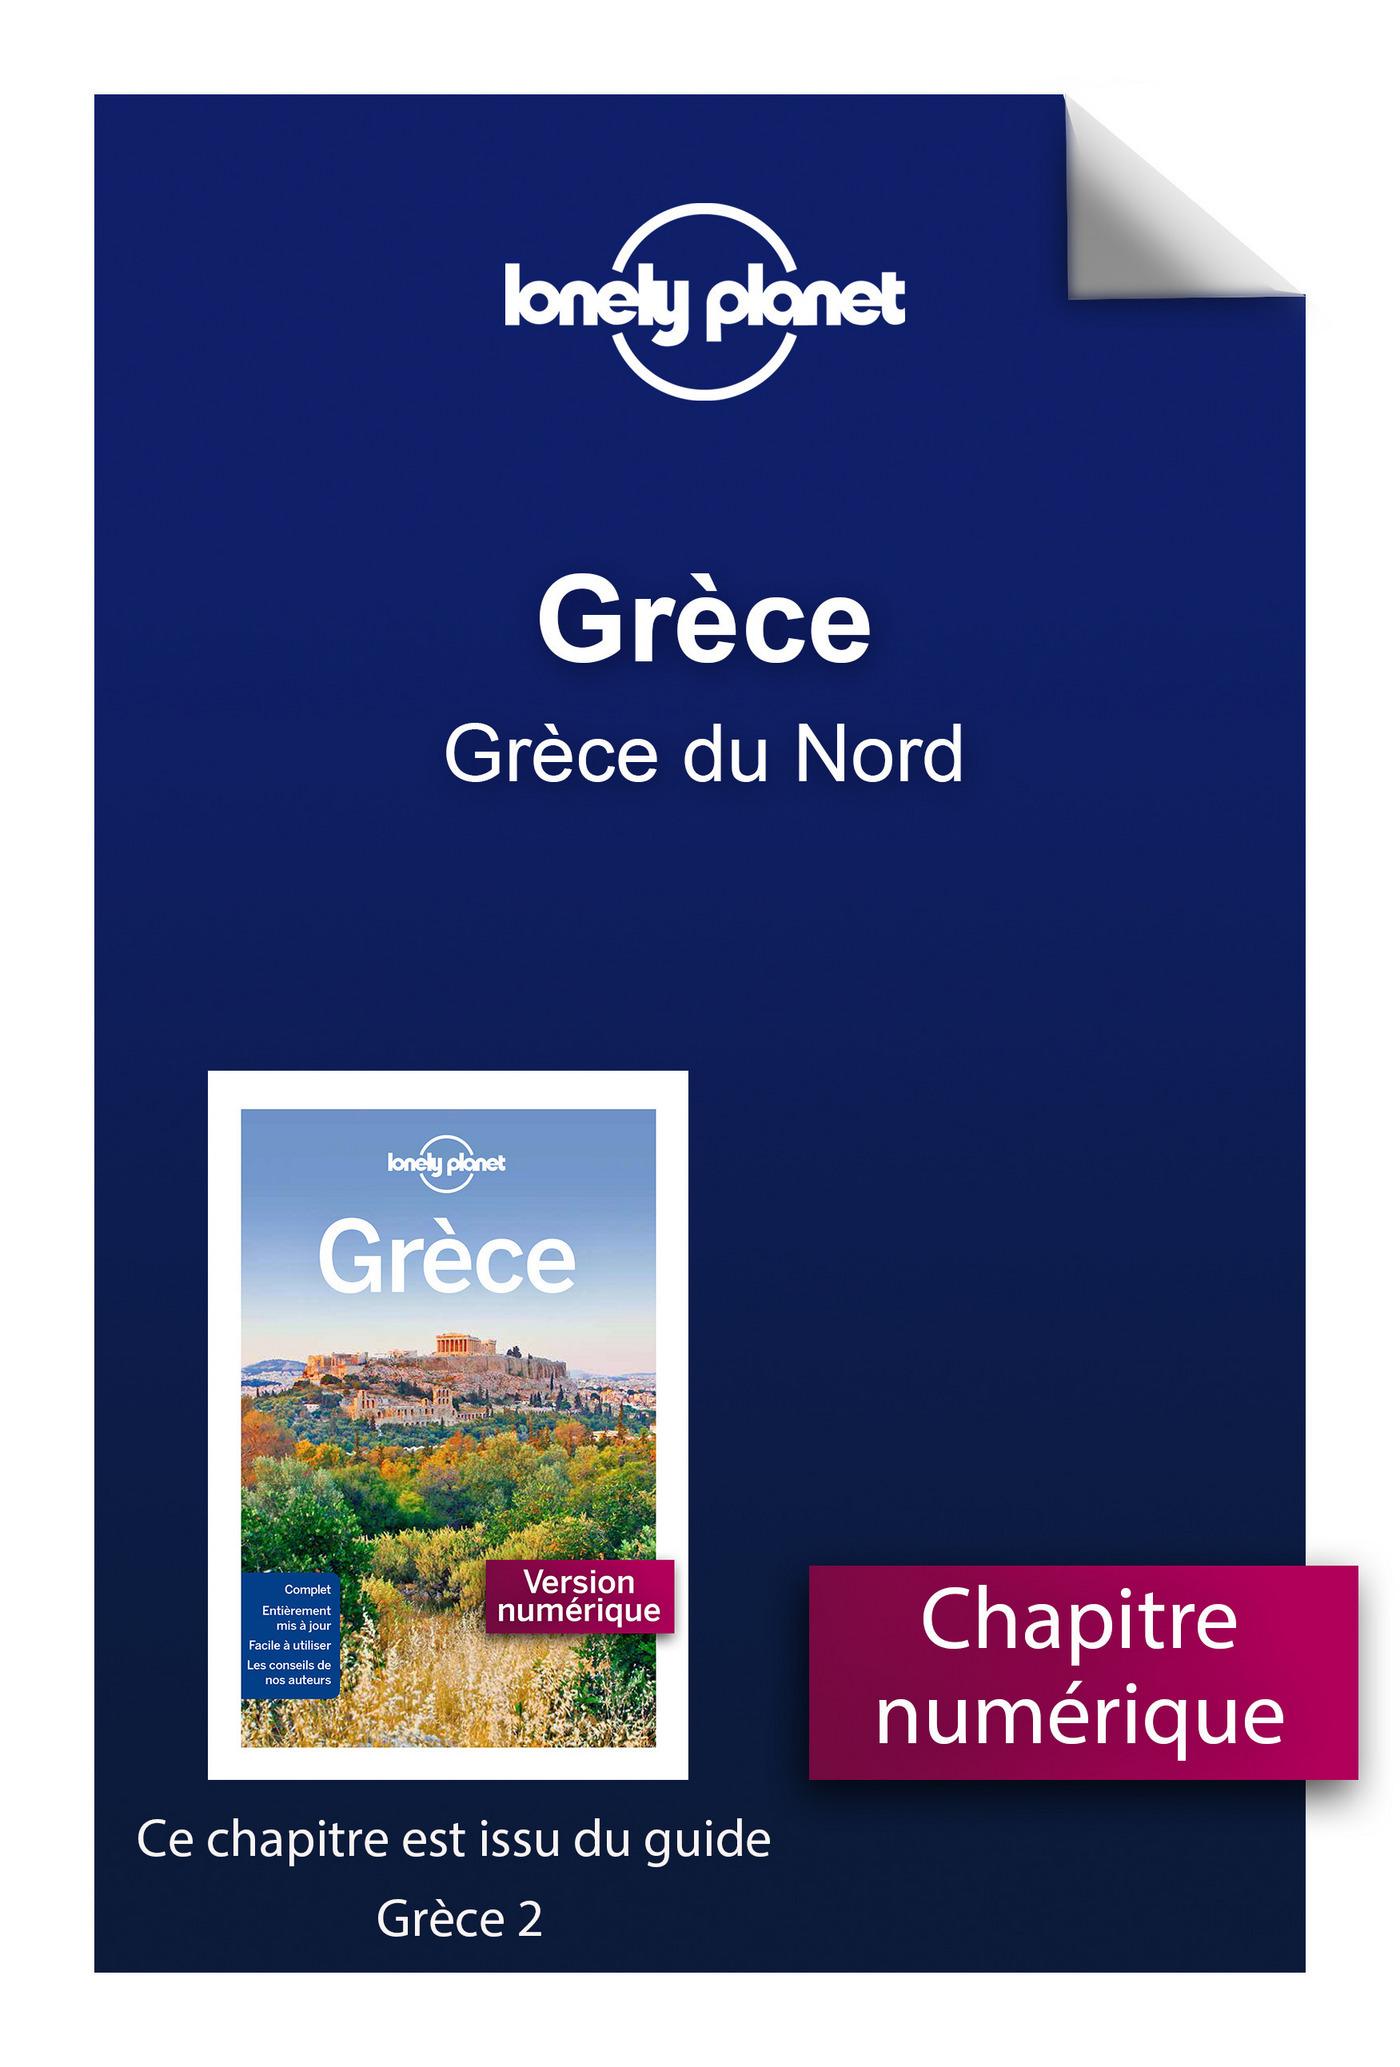 Grèce - Grèce du Nord